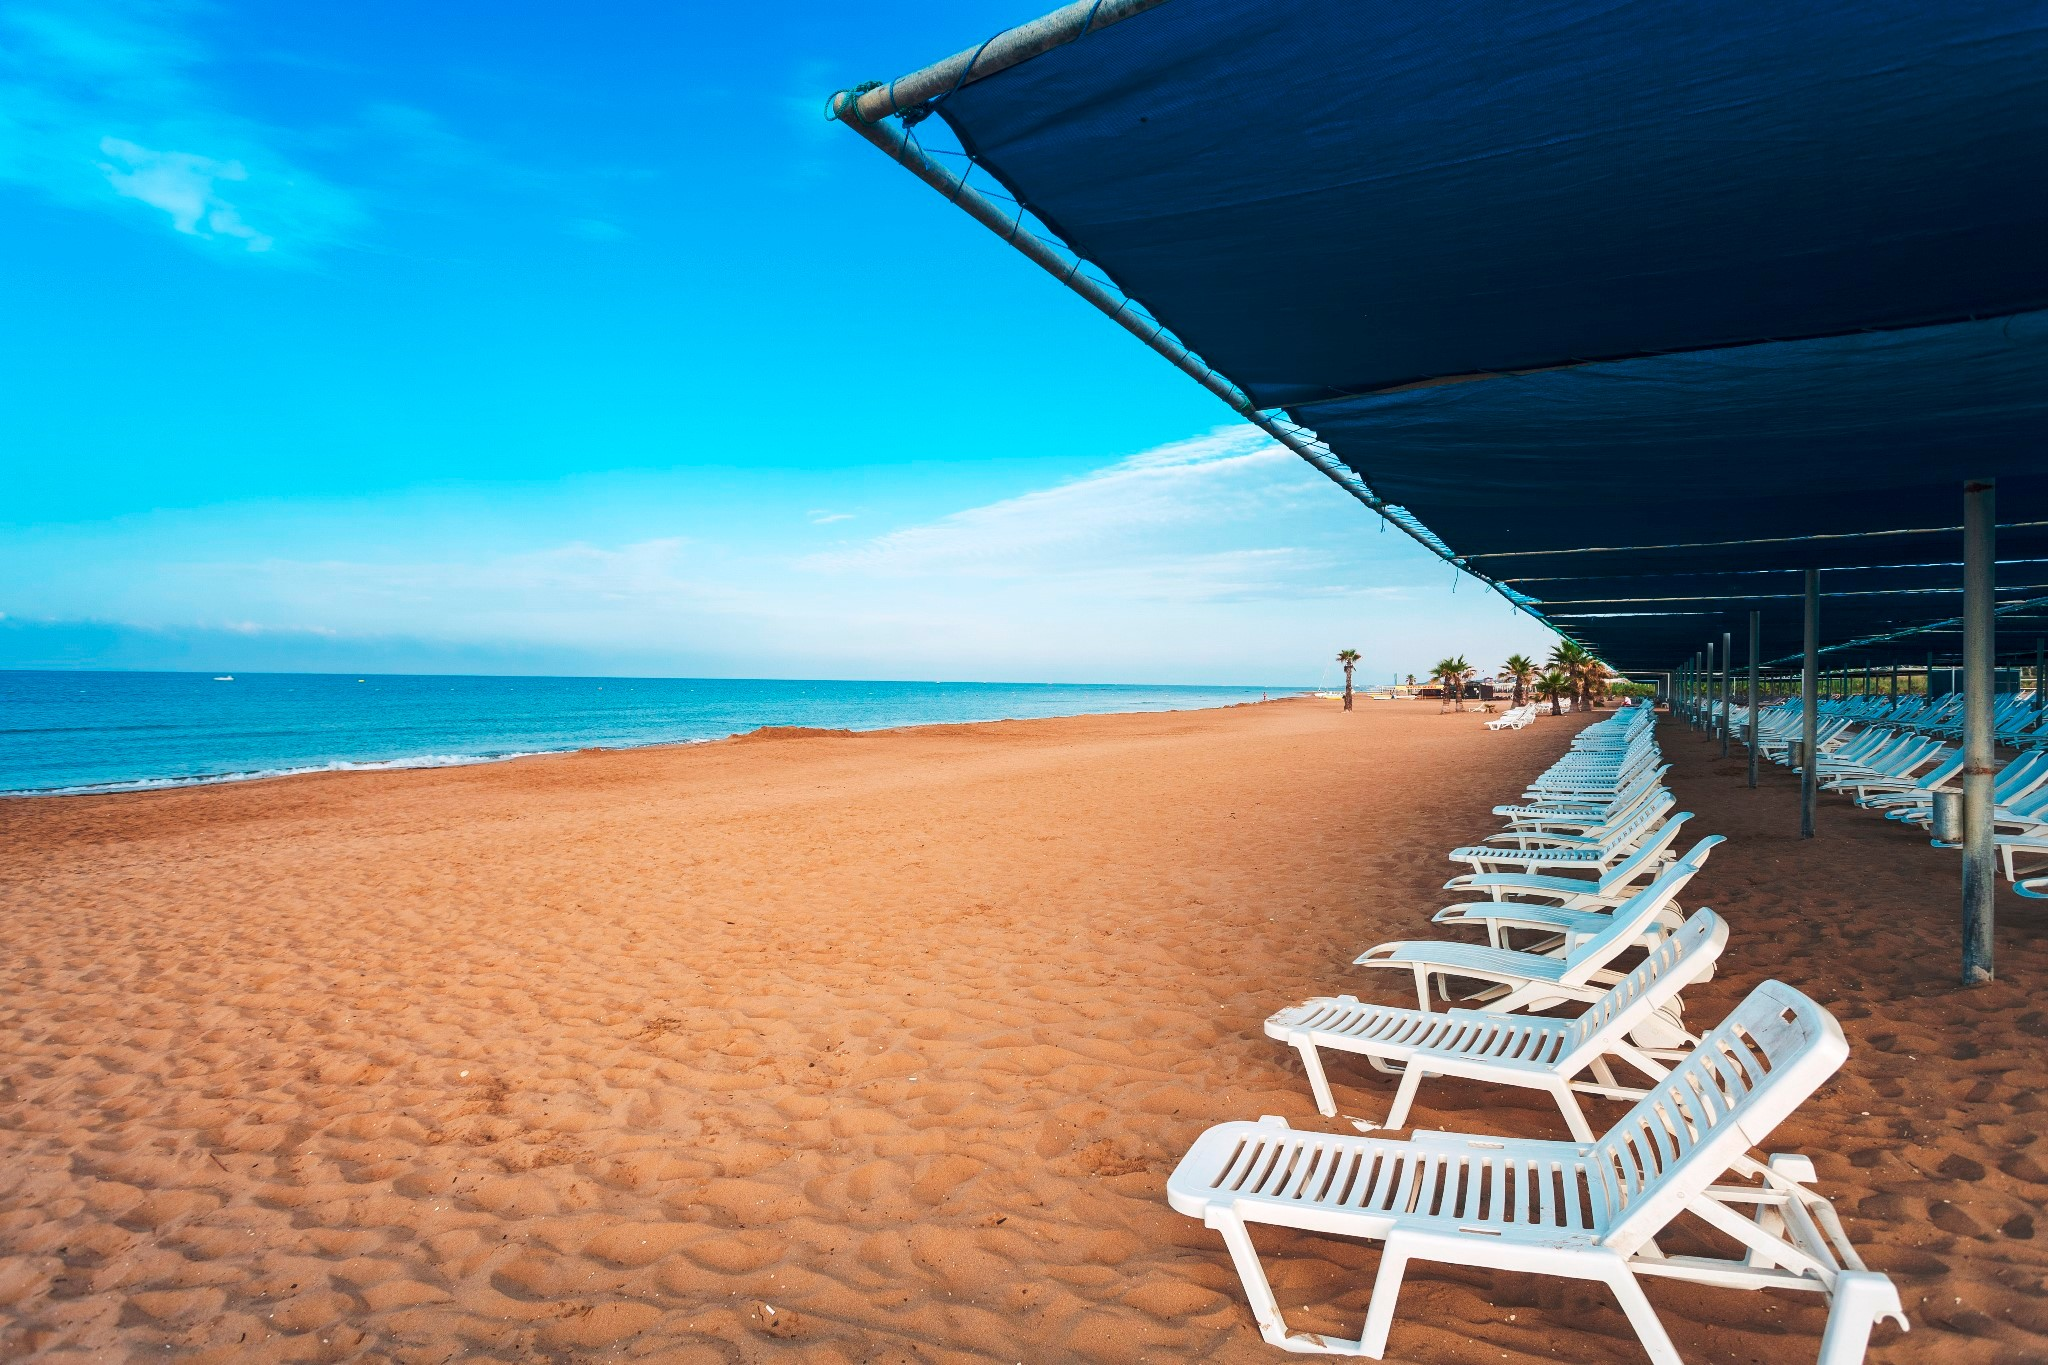 привыкли, пляжи сиде турция фото хошимина без багажа